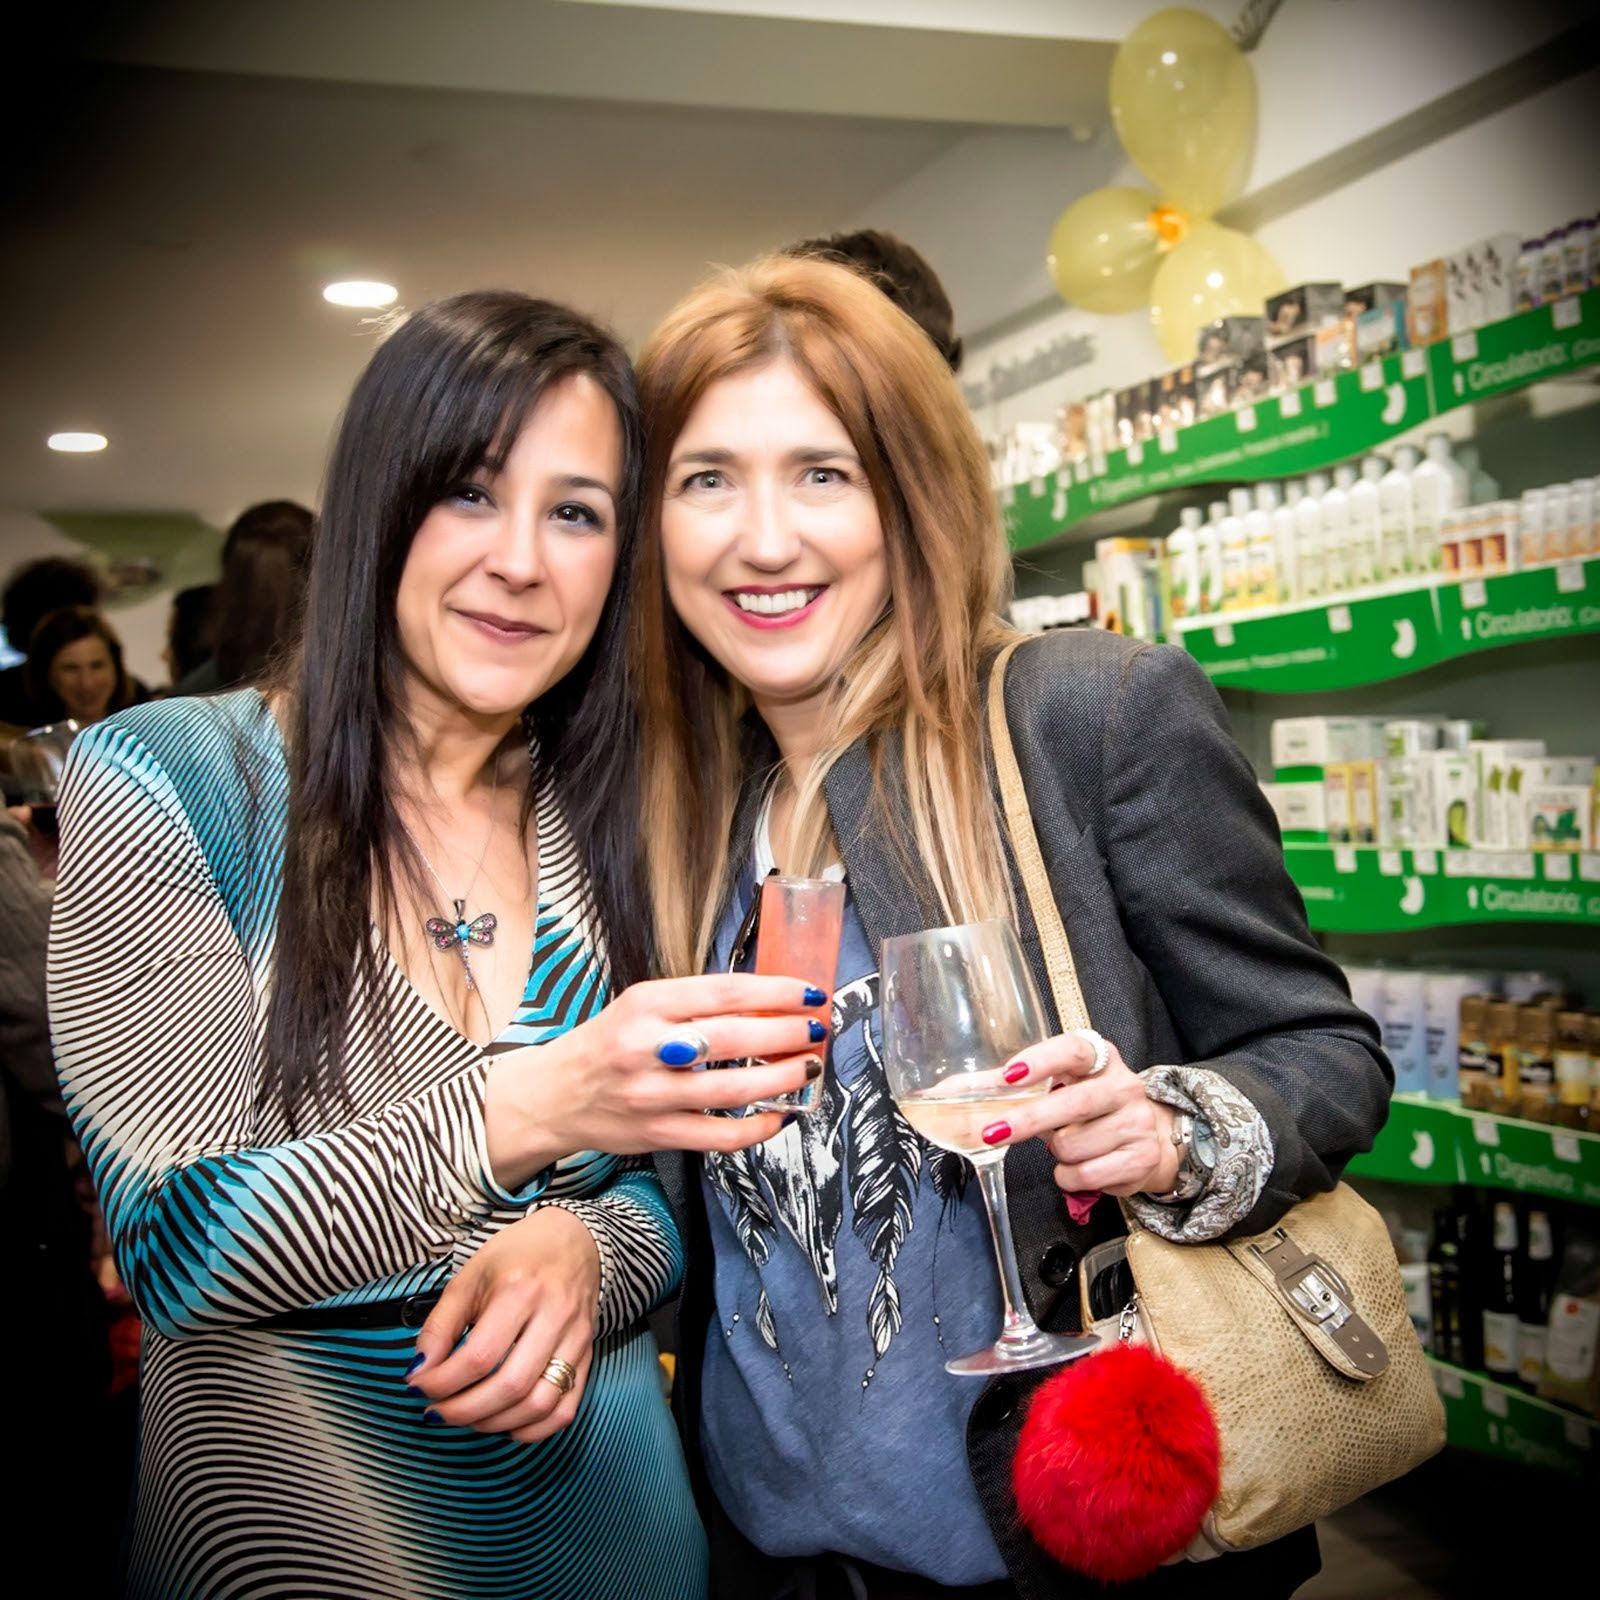 blogger, Carmen Hummer, Coaching, Flagship Store, Goya 57, Lifestyle, Naturlíder, Yo me quiero,